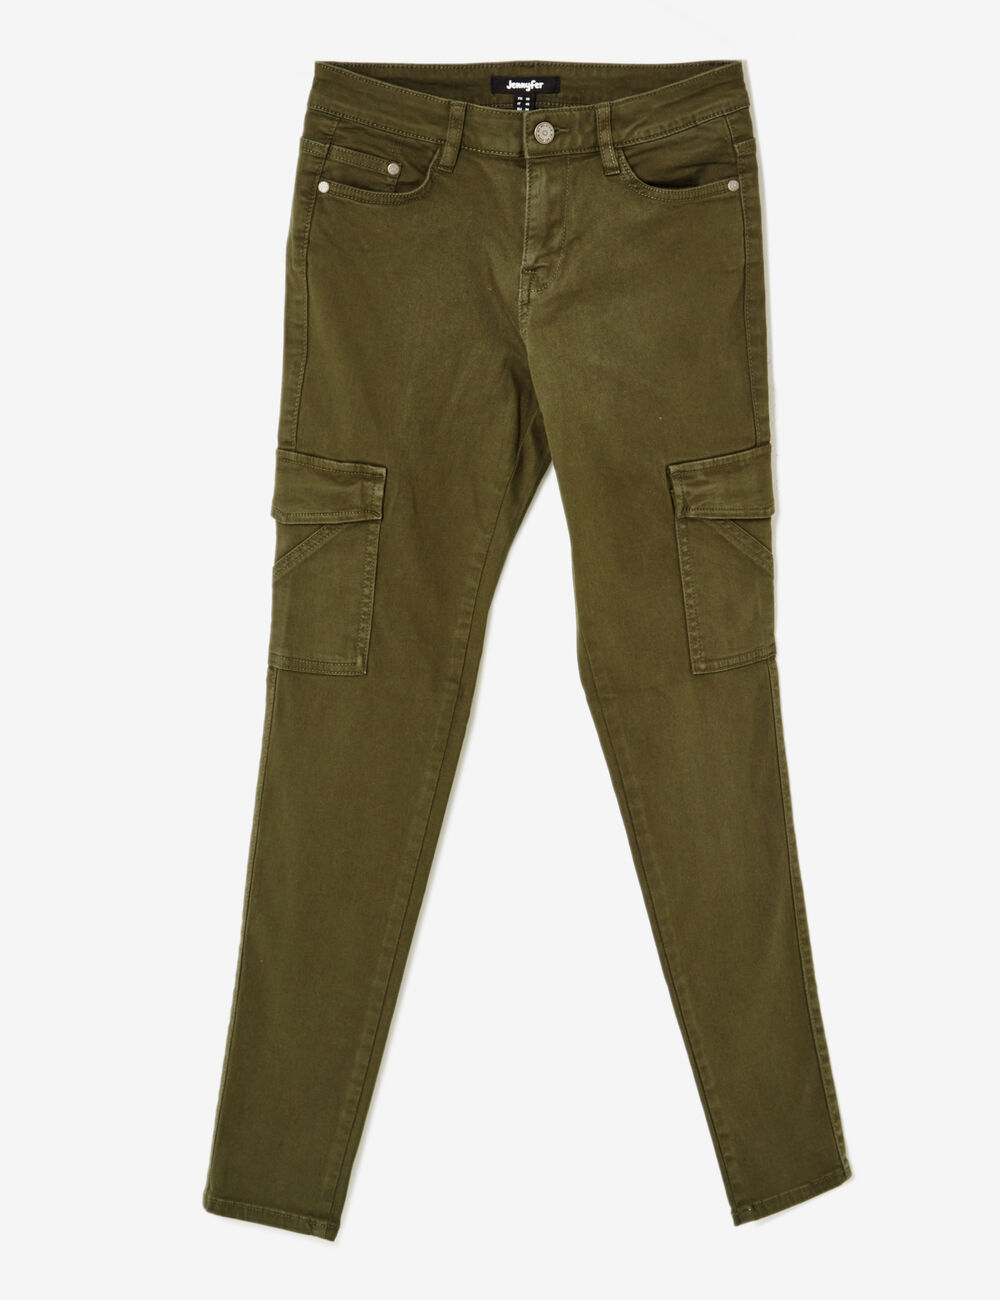 pantalon cargo poches kaki femme jennyfer. Black Bedroom Furniture Sets. Home Design Ideas